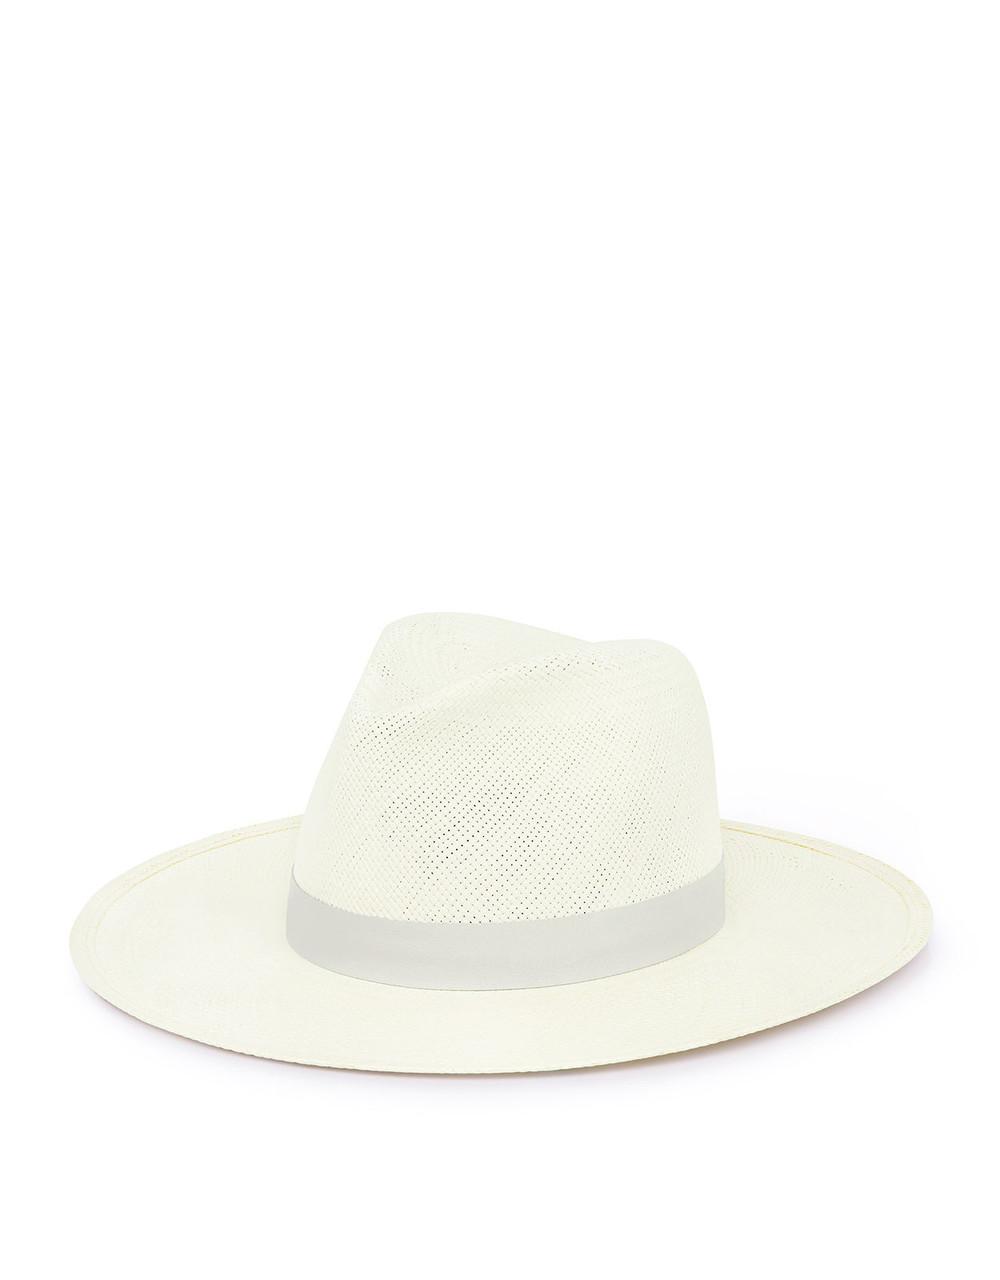 Janessa Leone Lina Bolero Hat - Black - Wheretoget a5f54a723ced